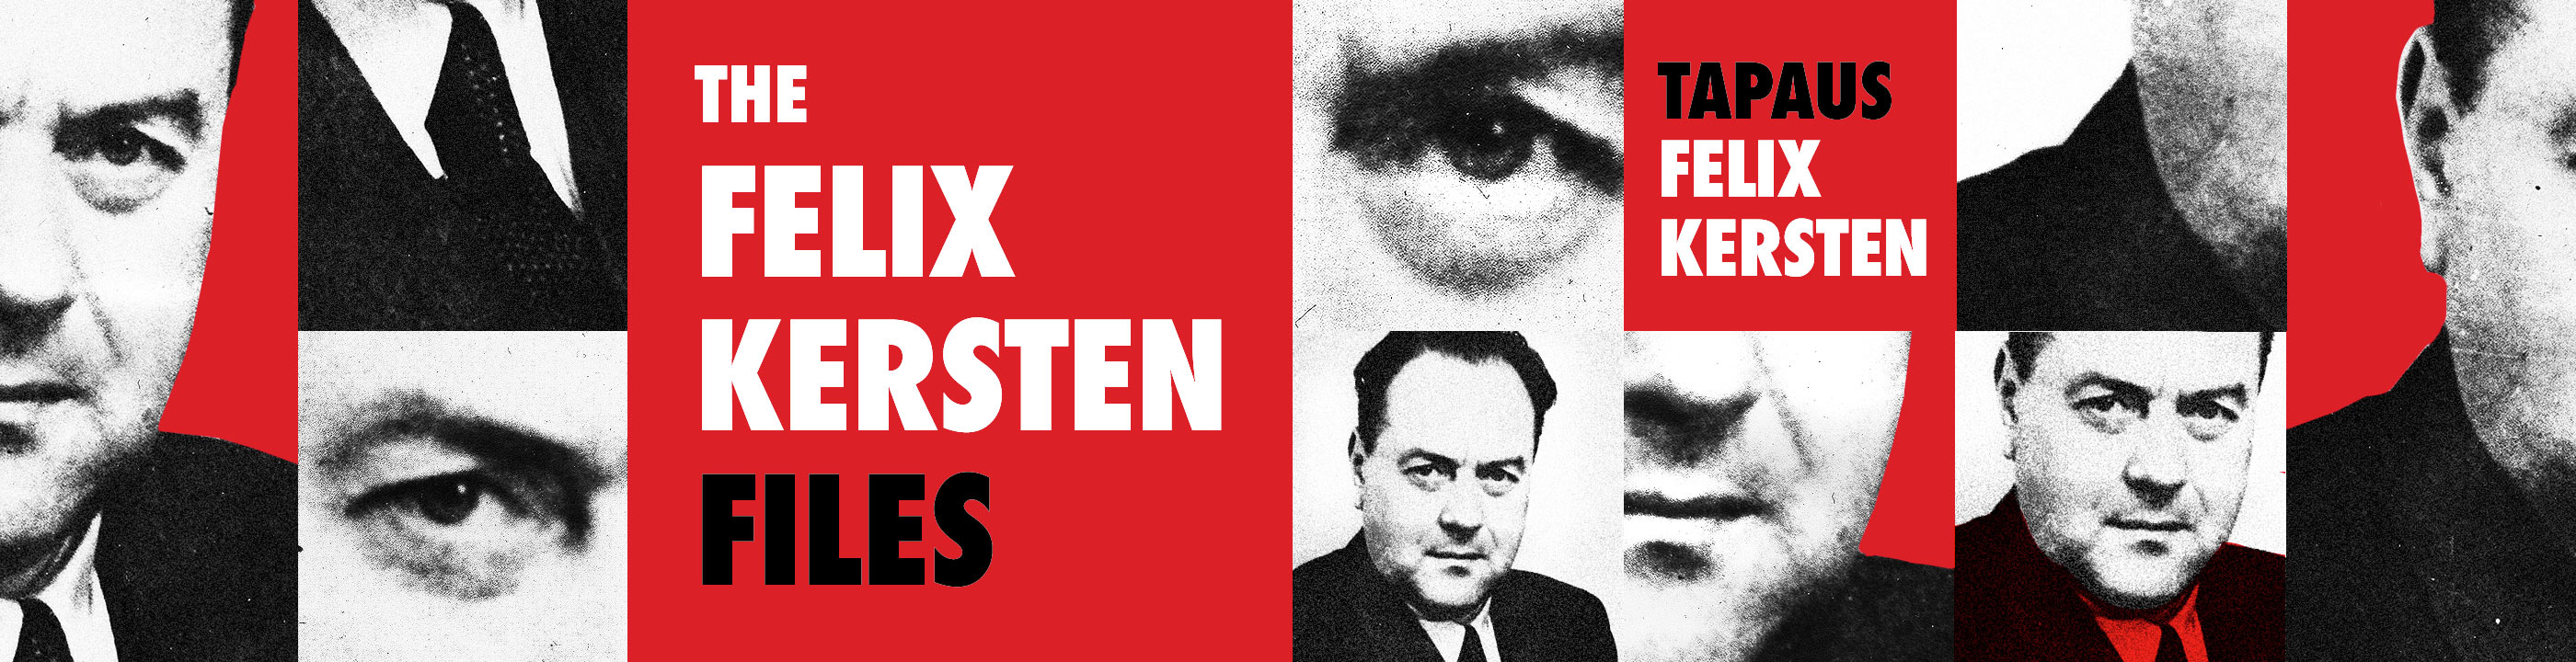 Subject page header image for Felix Kersten